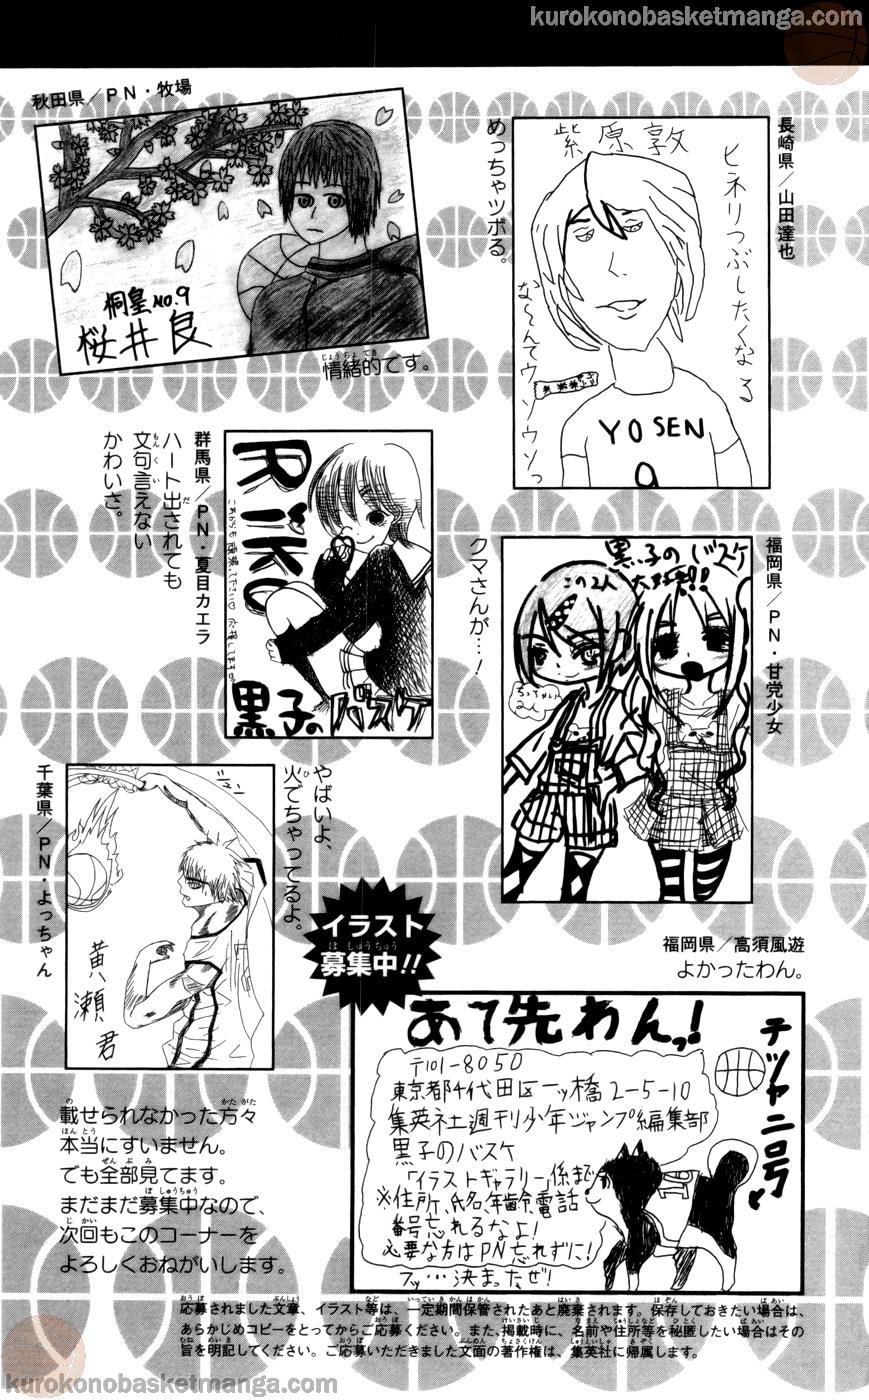 Kuroko no Basket Manga Chapter 108 - Image 28